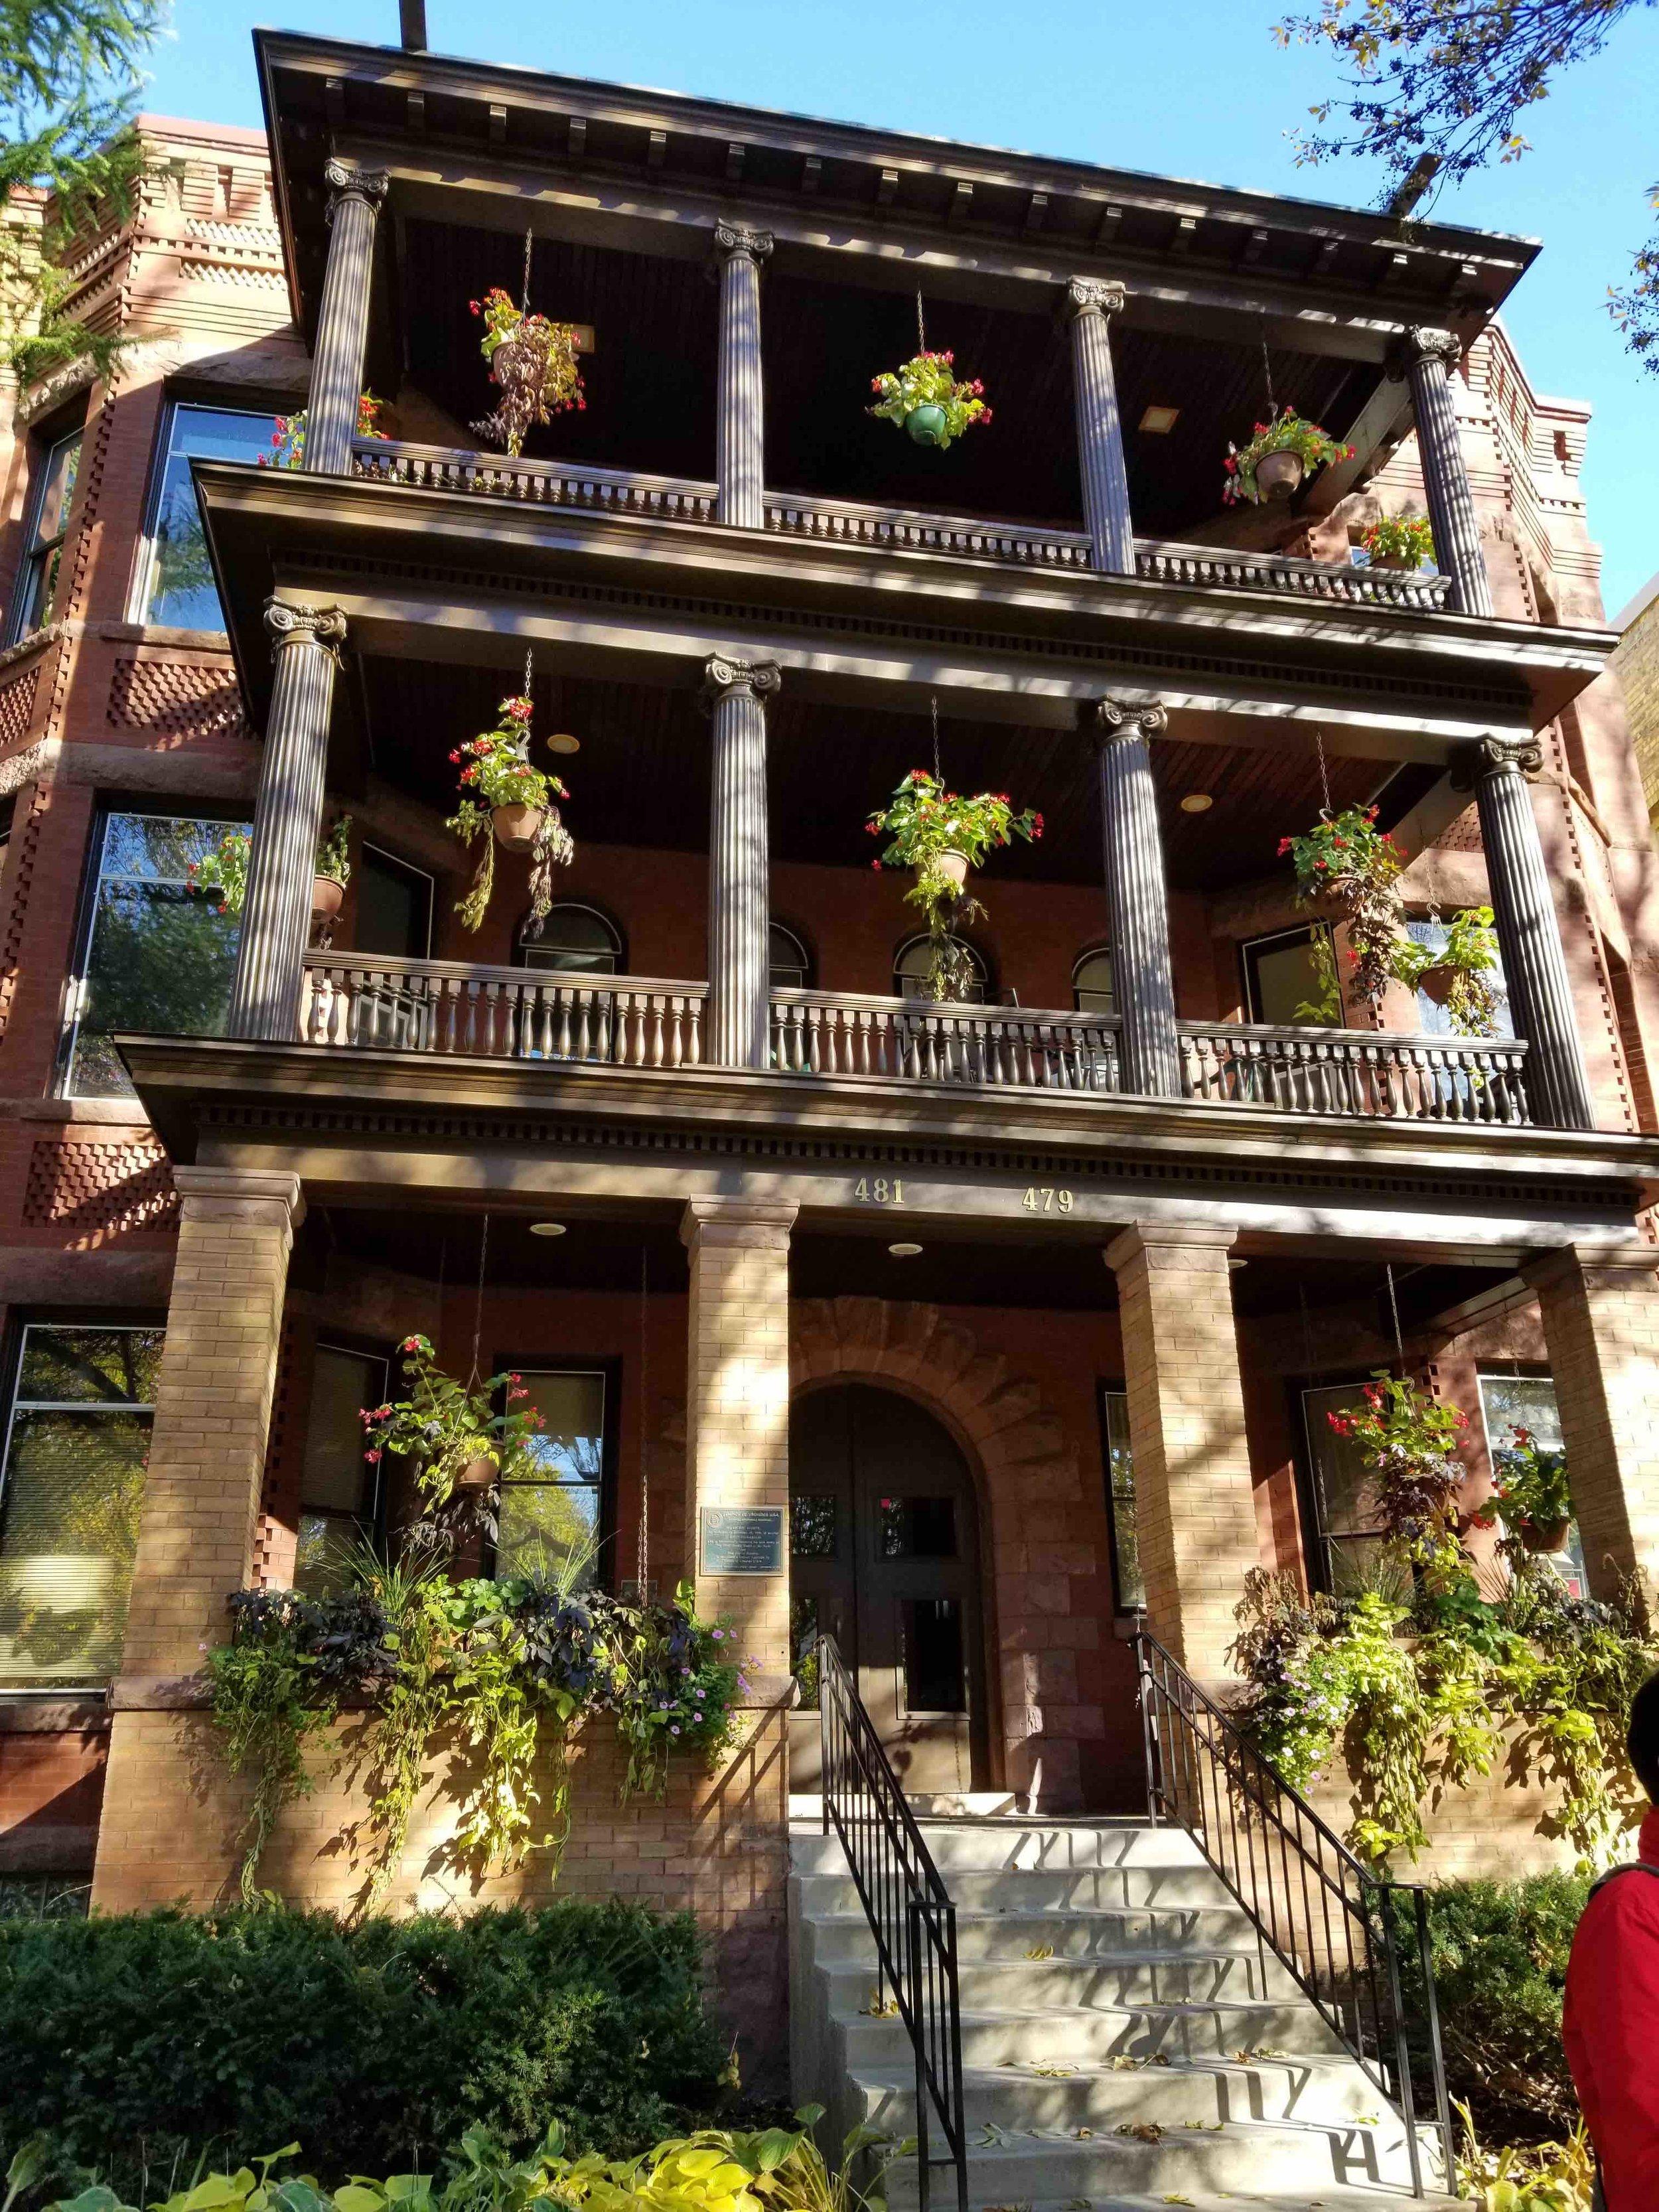 Home Birthplace 481 Laurel 2018-10-18 10.32.39 copy.jpg